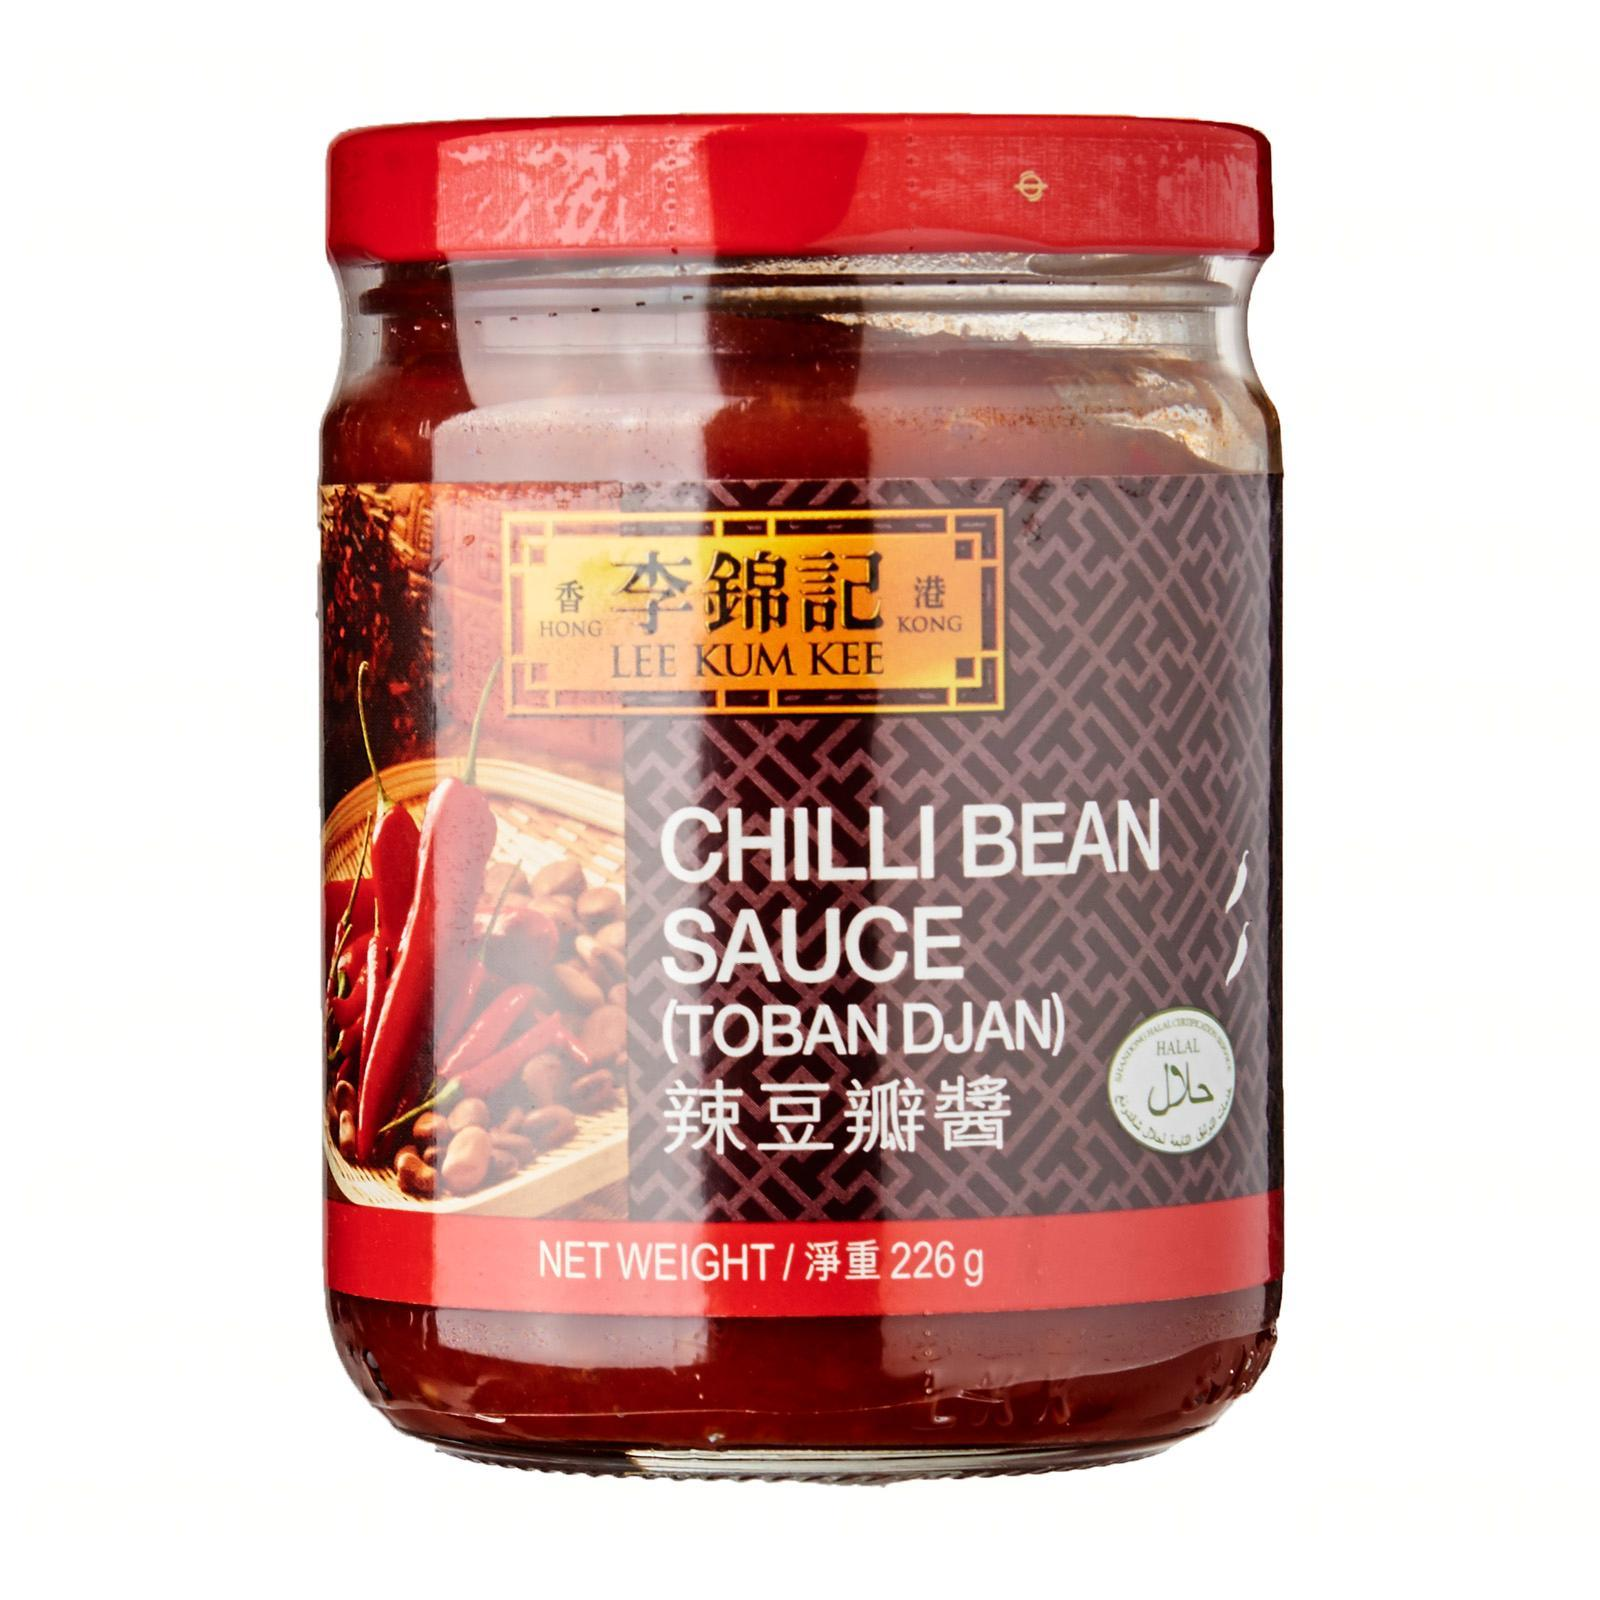 Lee Kum Kee Chili Bean (Toban Djan) Sauce